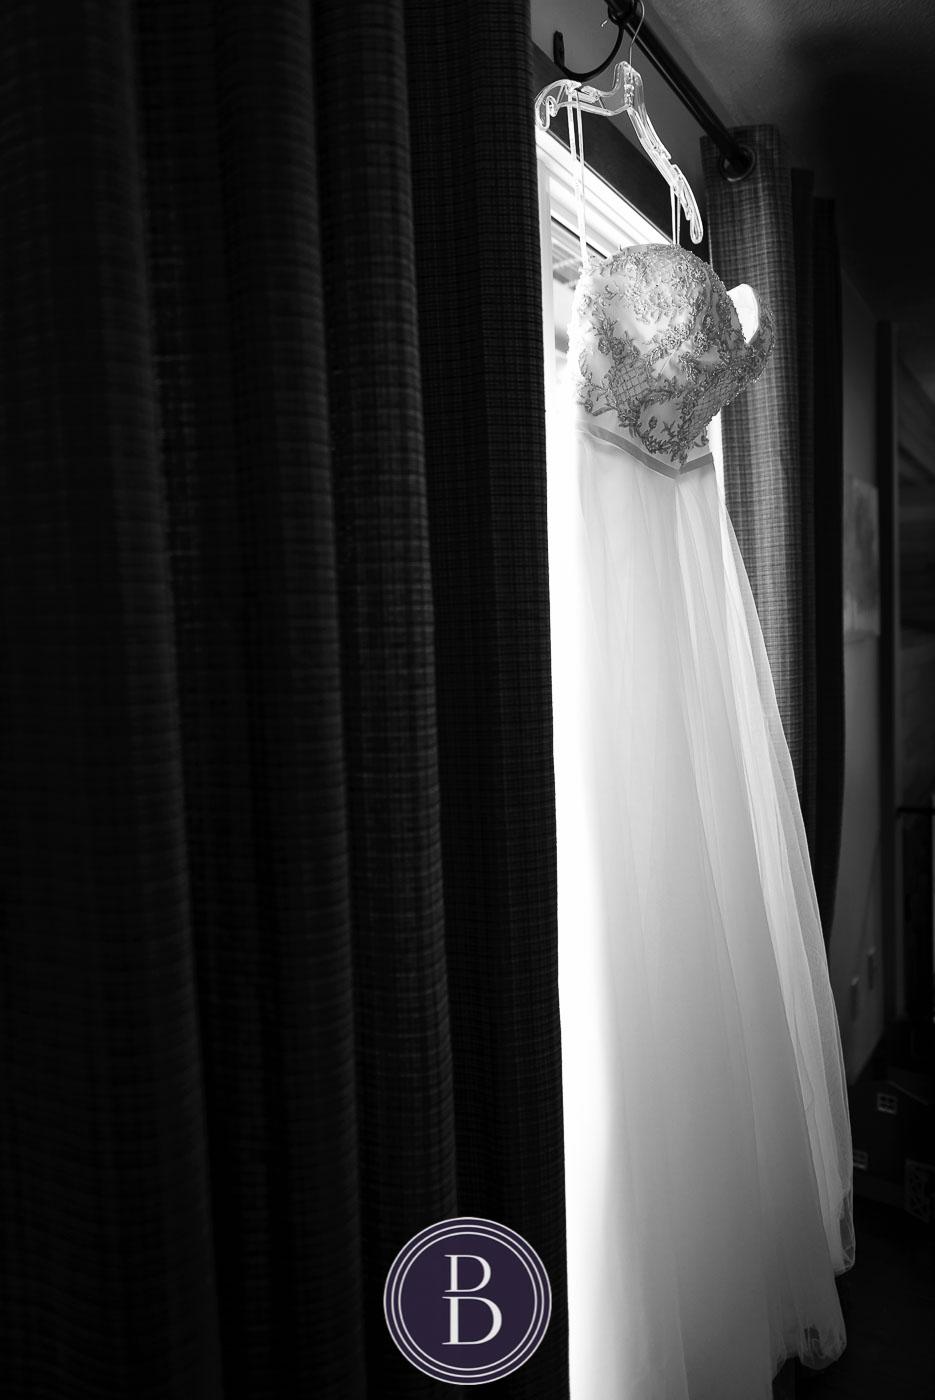 Brides dress on window